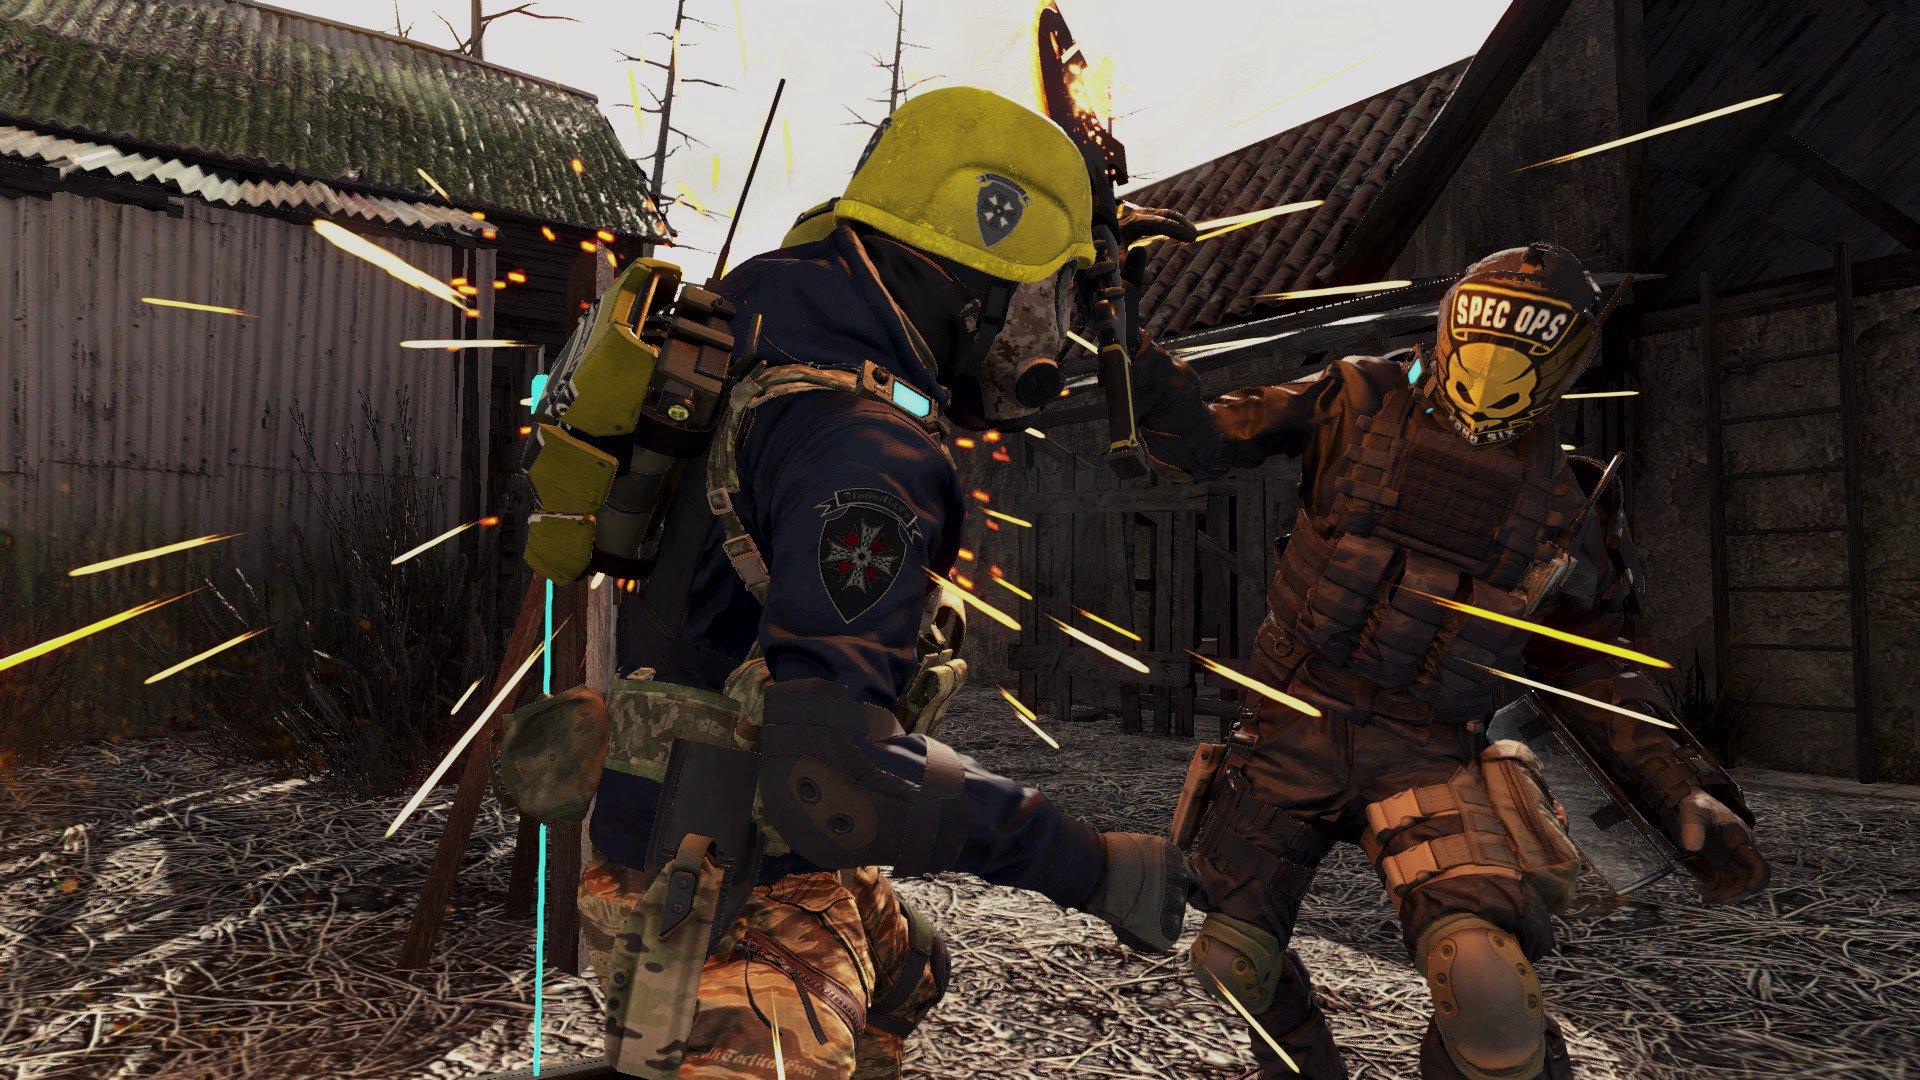 Umbrella Corps / Biohazard Umbrella Corps 9